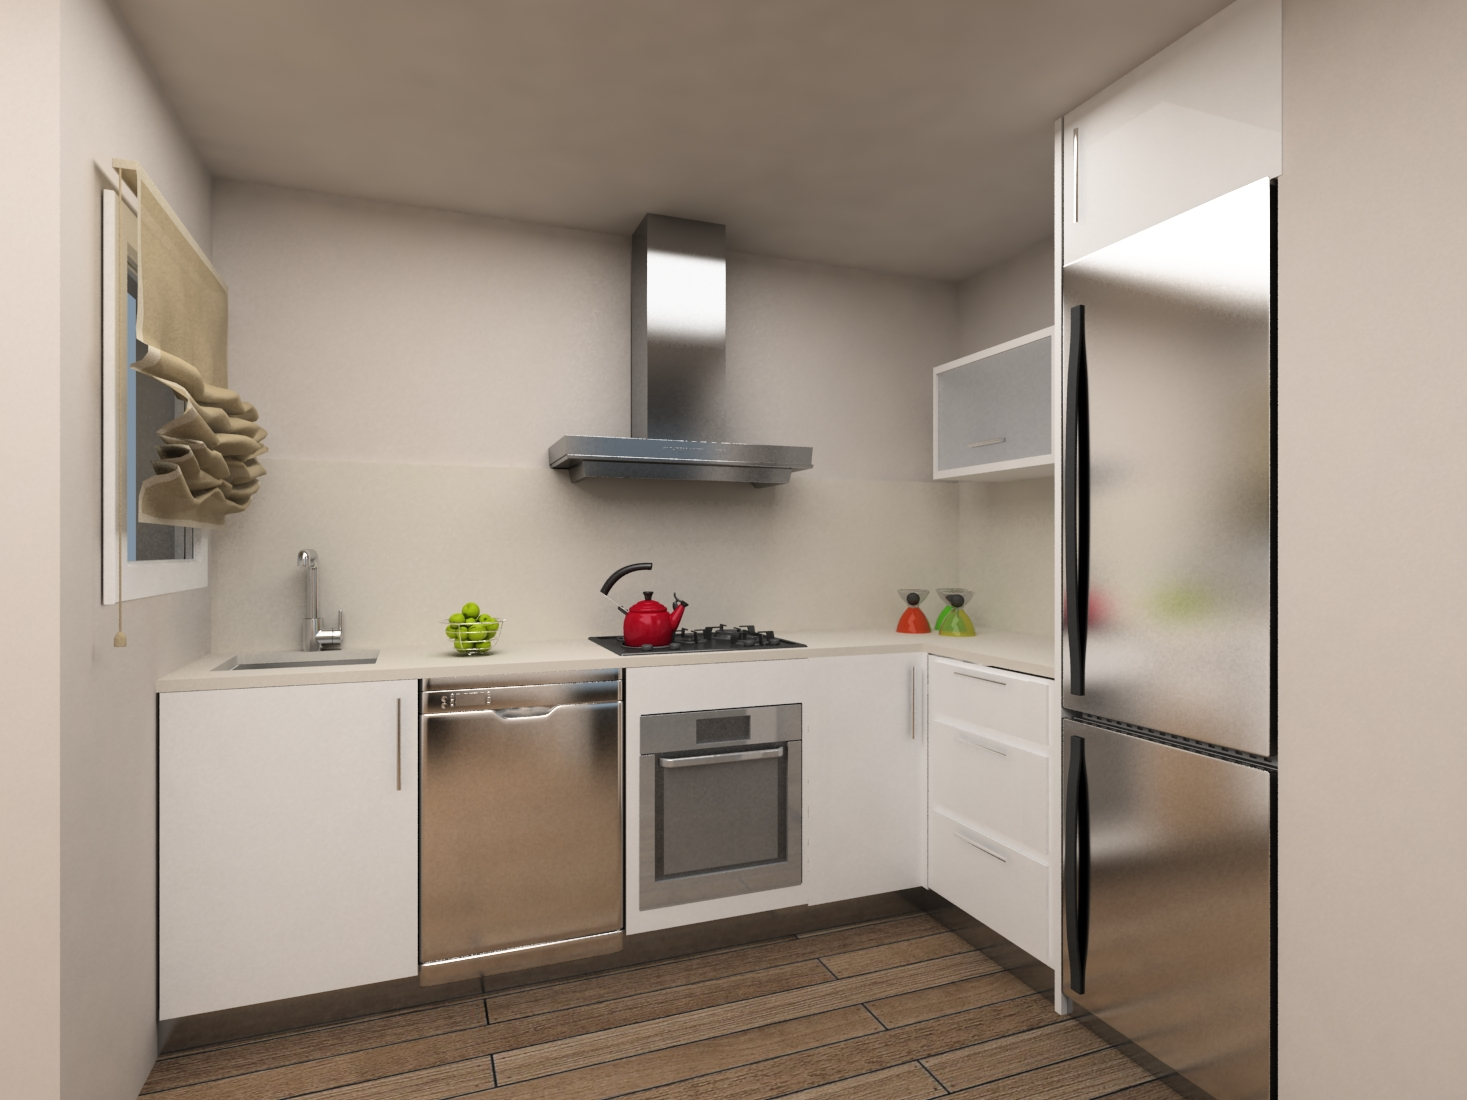 Alicatados de cocinas modernas perfect best lamparas de for Alicatados de cocinas